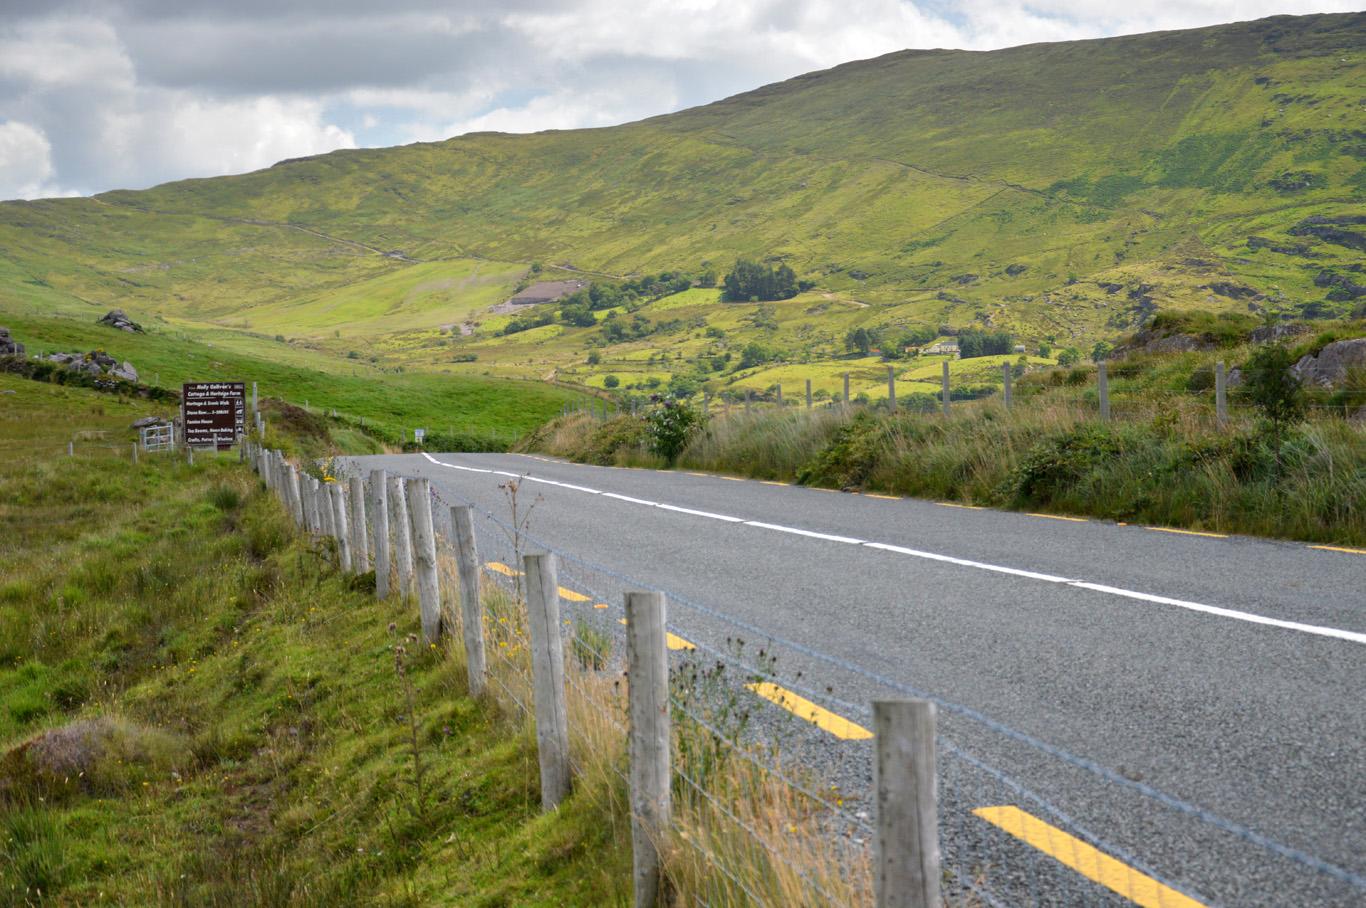 Typical Irish landscape